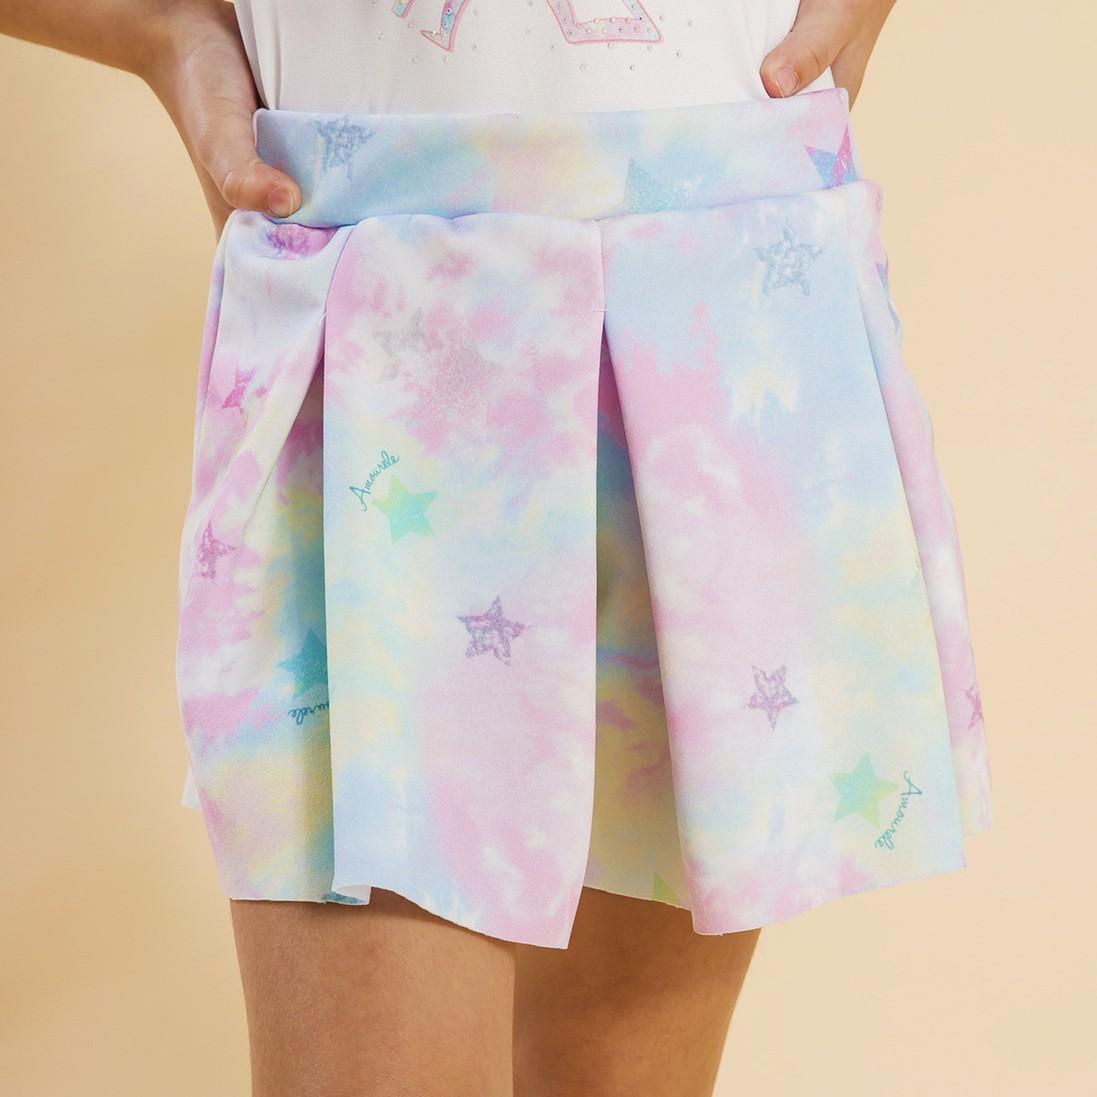 Shorts Malha Infantil Tie Dye Rosa